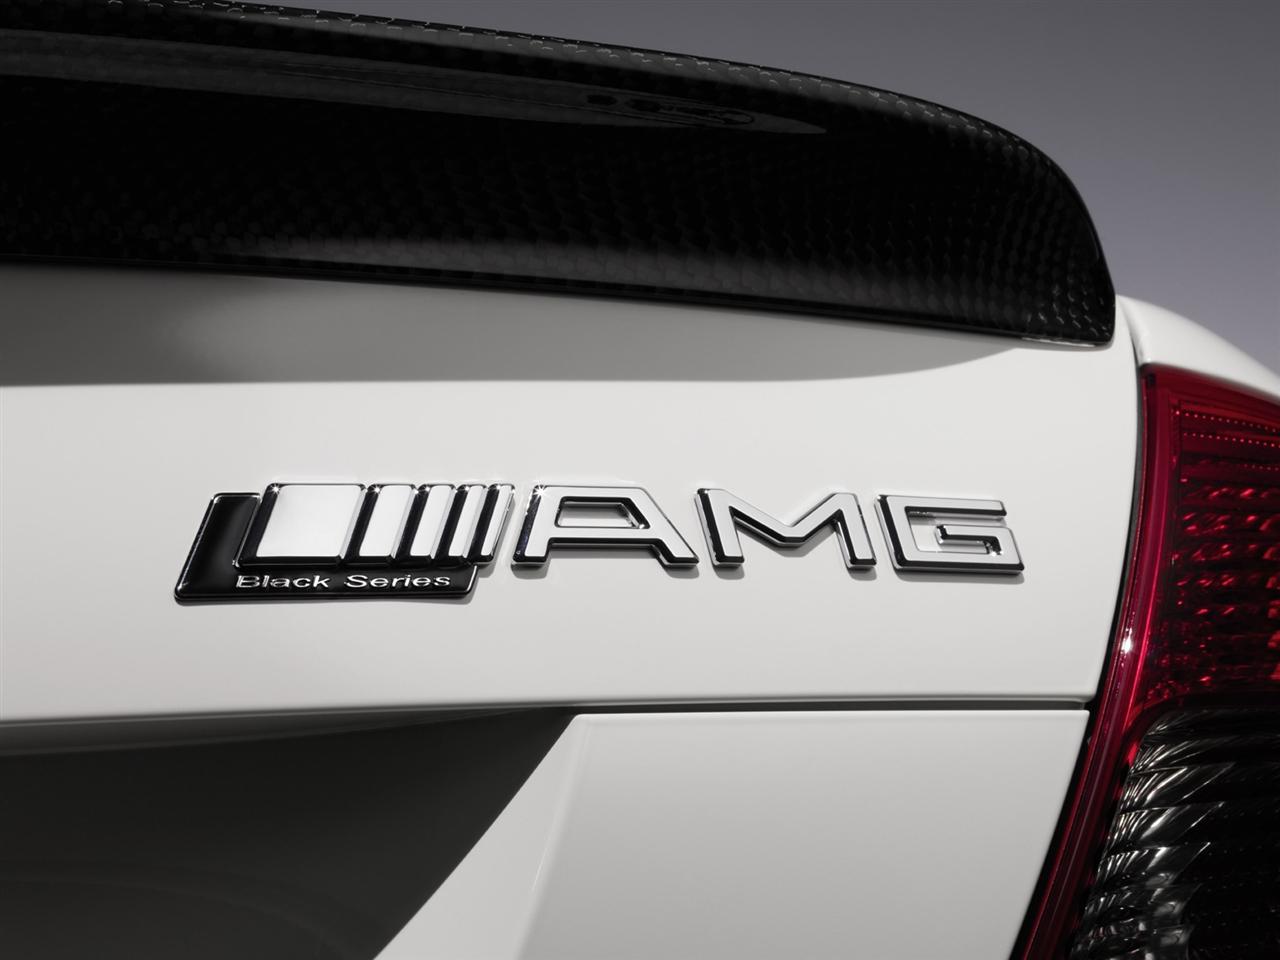 Stormtrooper Mercedes AMG 1280x960